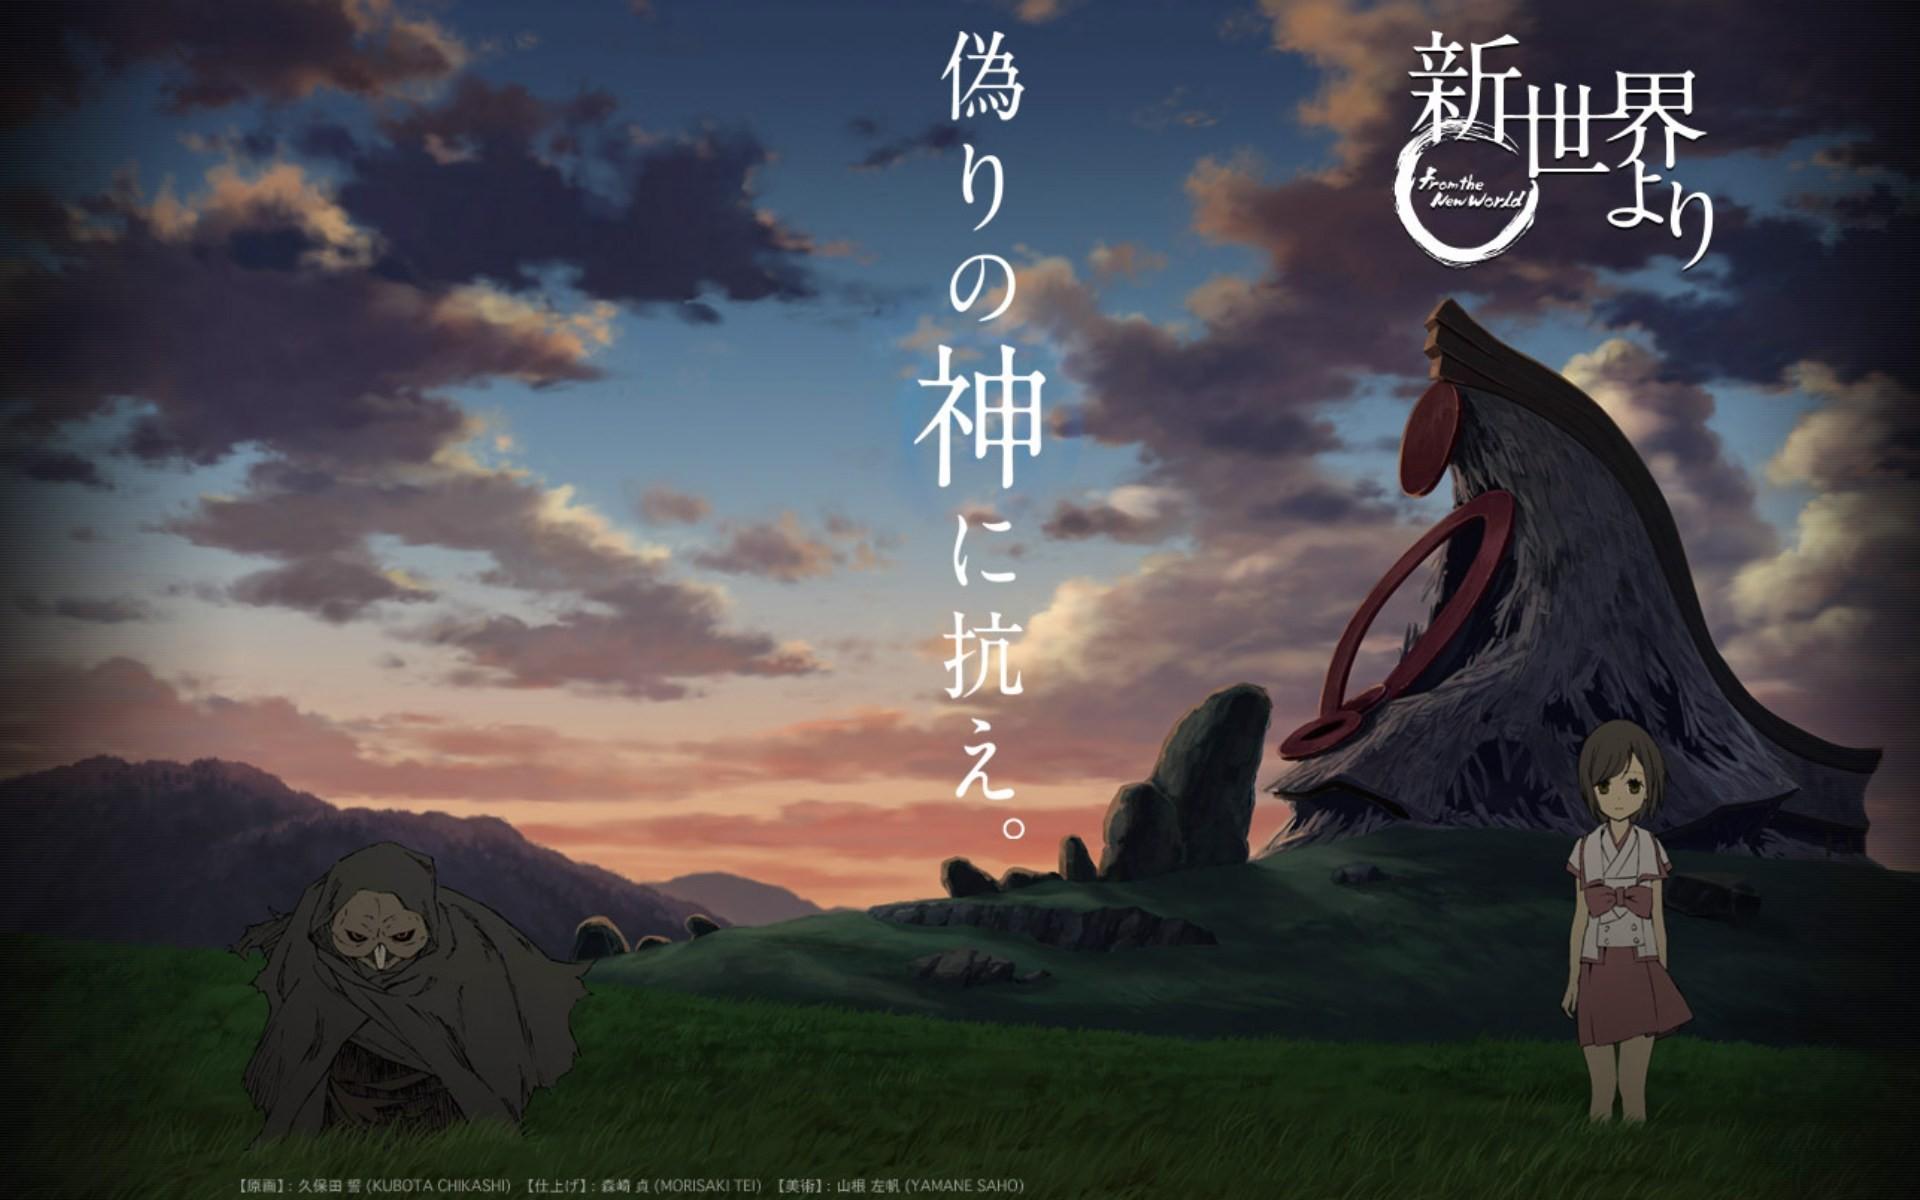 Wallpaper Anime Mythology Shinsekai Yori Screenshot Computer